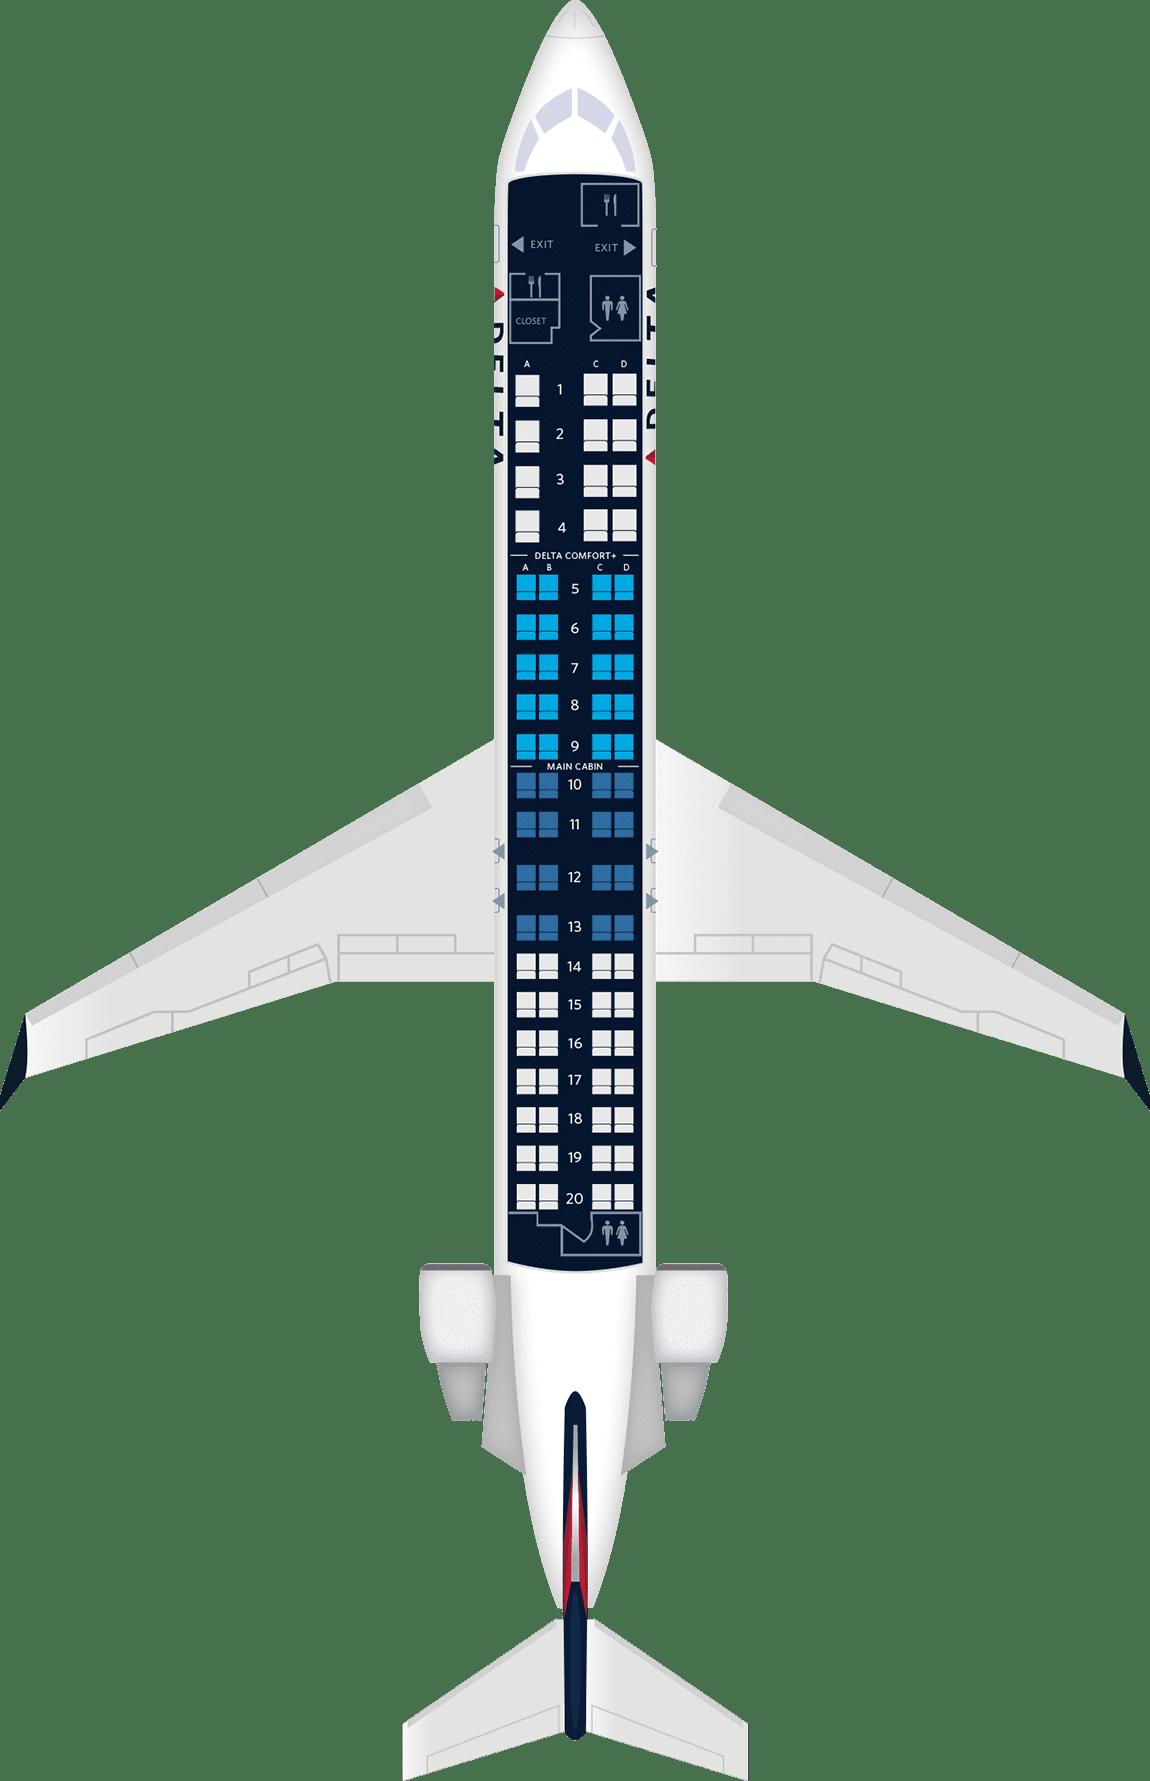 Aircraft Seats: Bombardier CRJ-900 Aircraft Seat Maps, Specs & Amenities